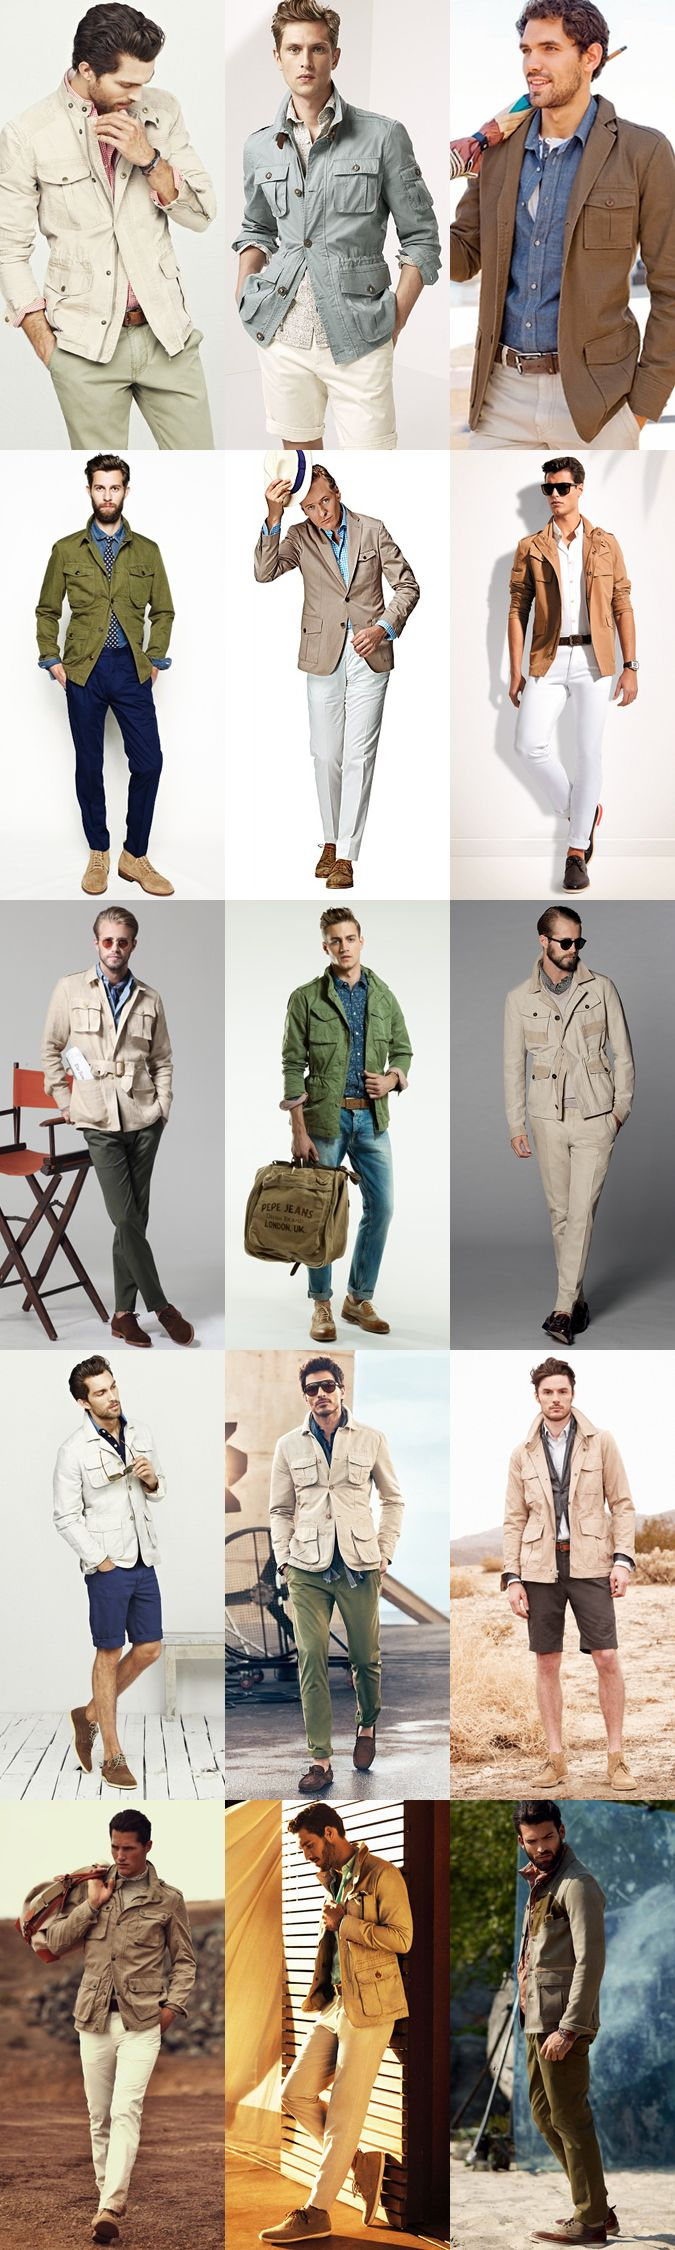 Style Inspiration: Modern Safari - The Safari Jacket Lookbook Inspiration